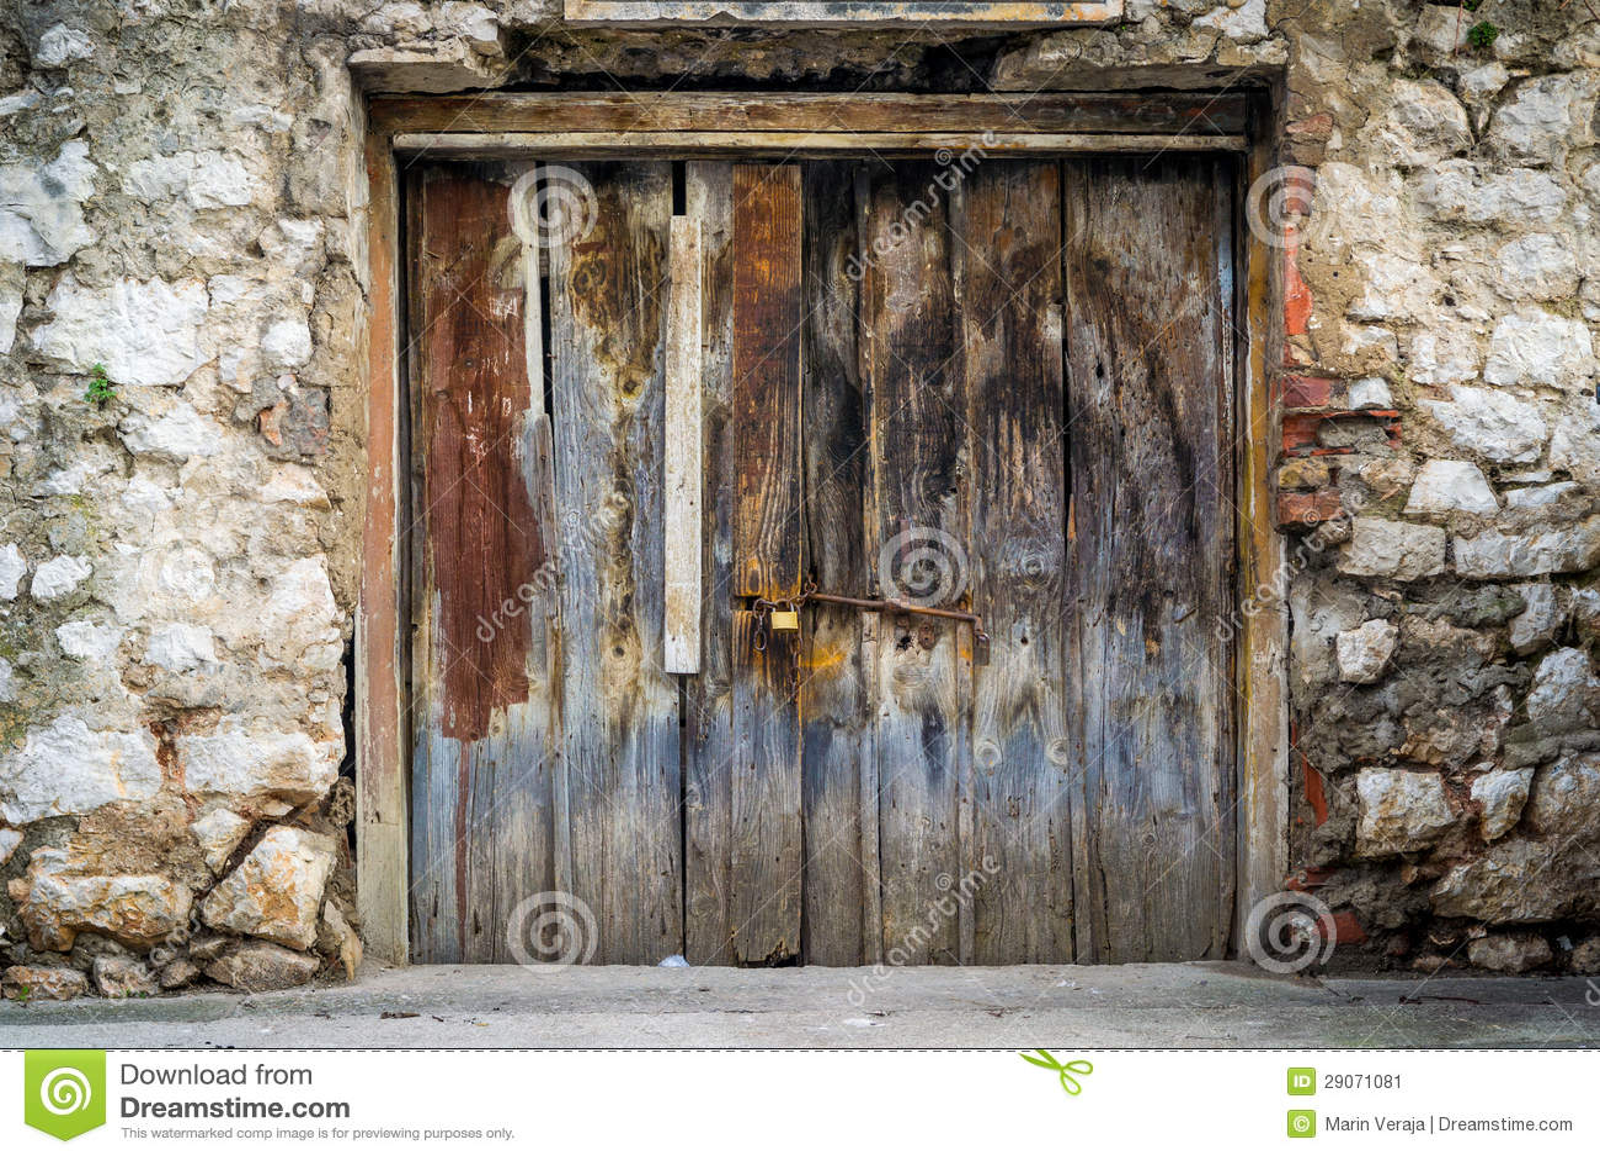 404 not found - Puerta madera rustica ...